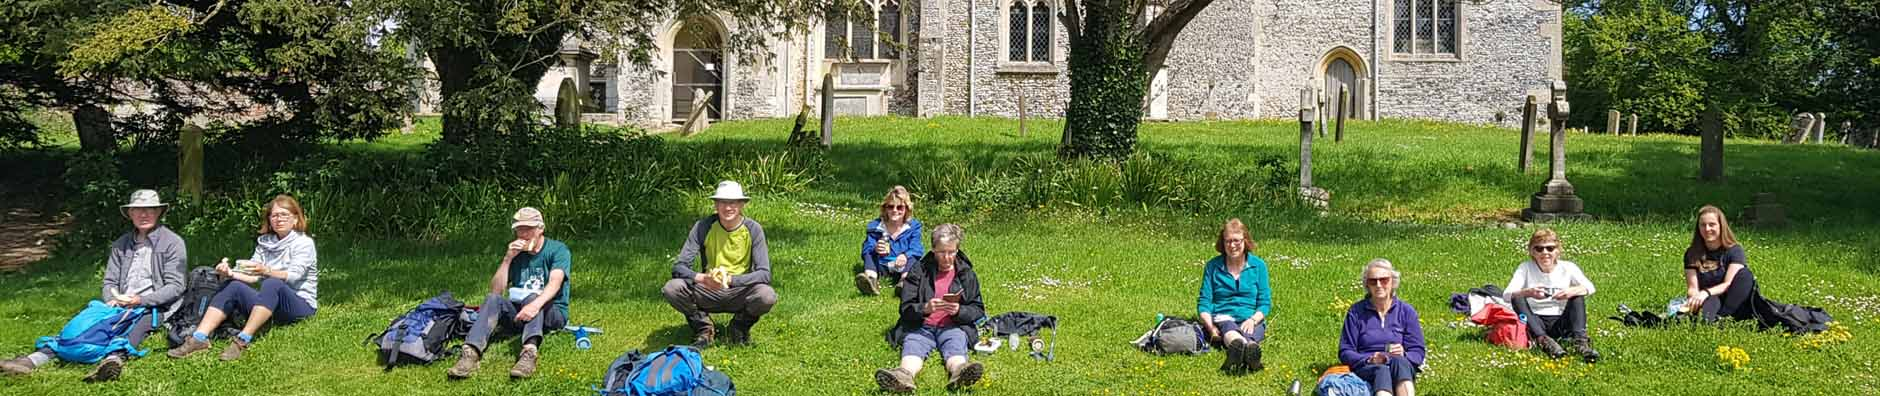 Wednesday walk (Dalham) - May 2021